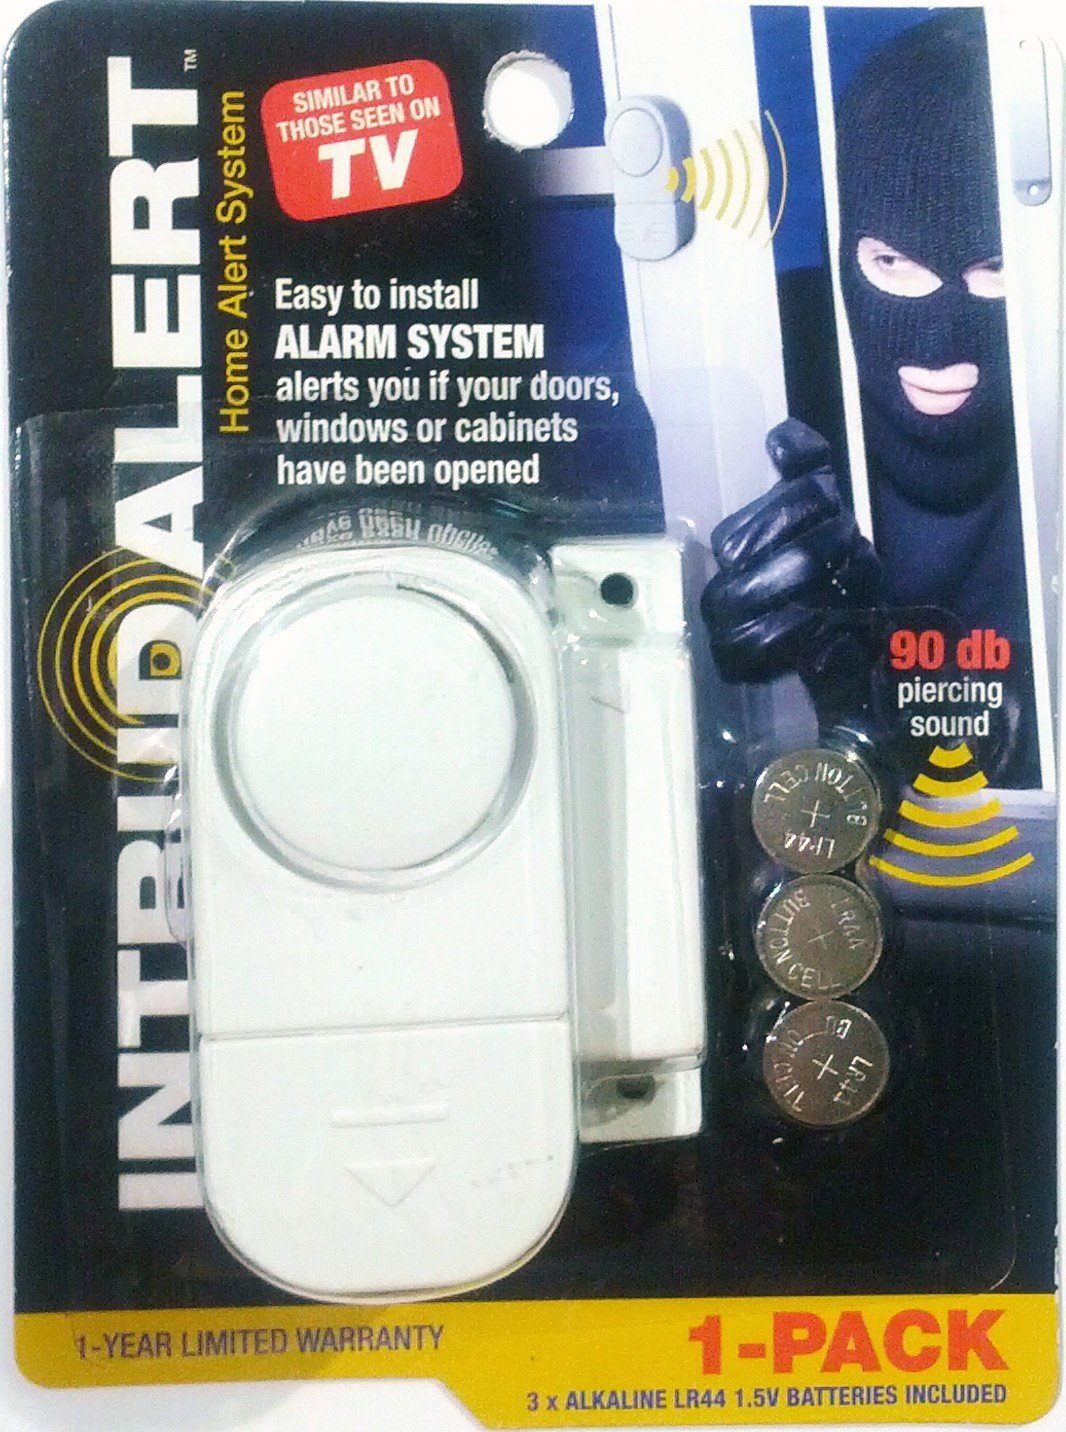 Intrud Alert Window & Door Alarm: Battery Operated; Compact; White Greenbrier International 855931